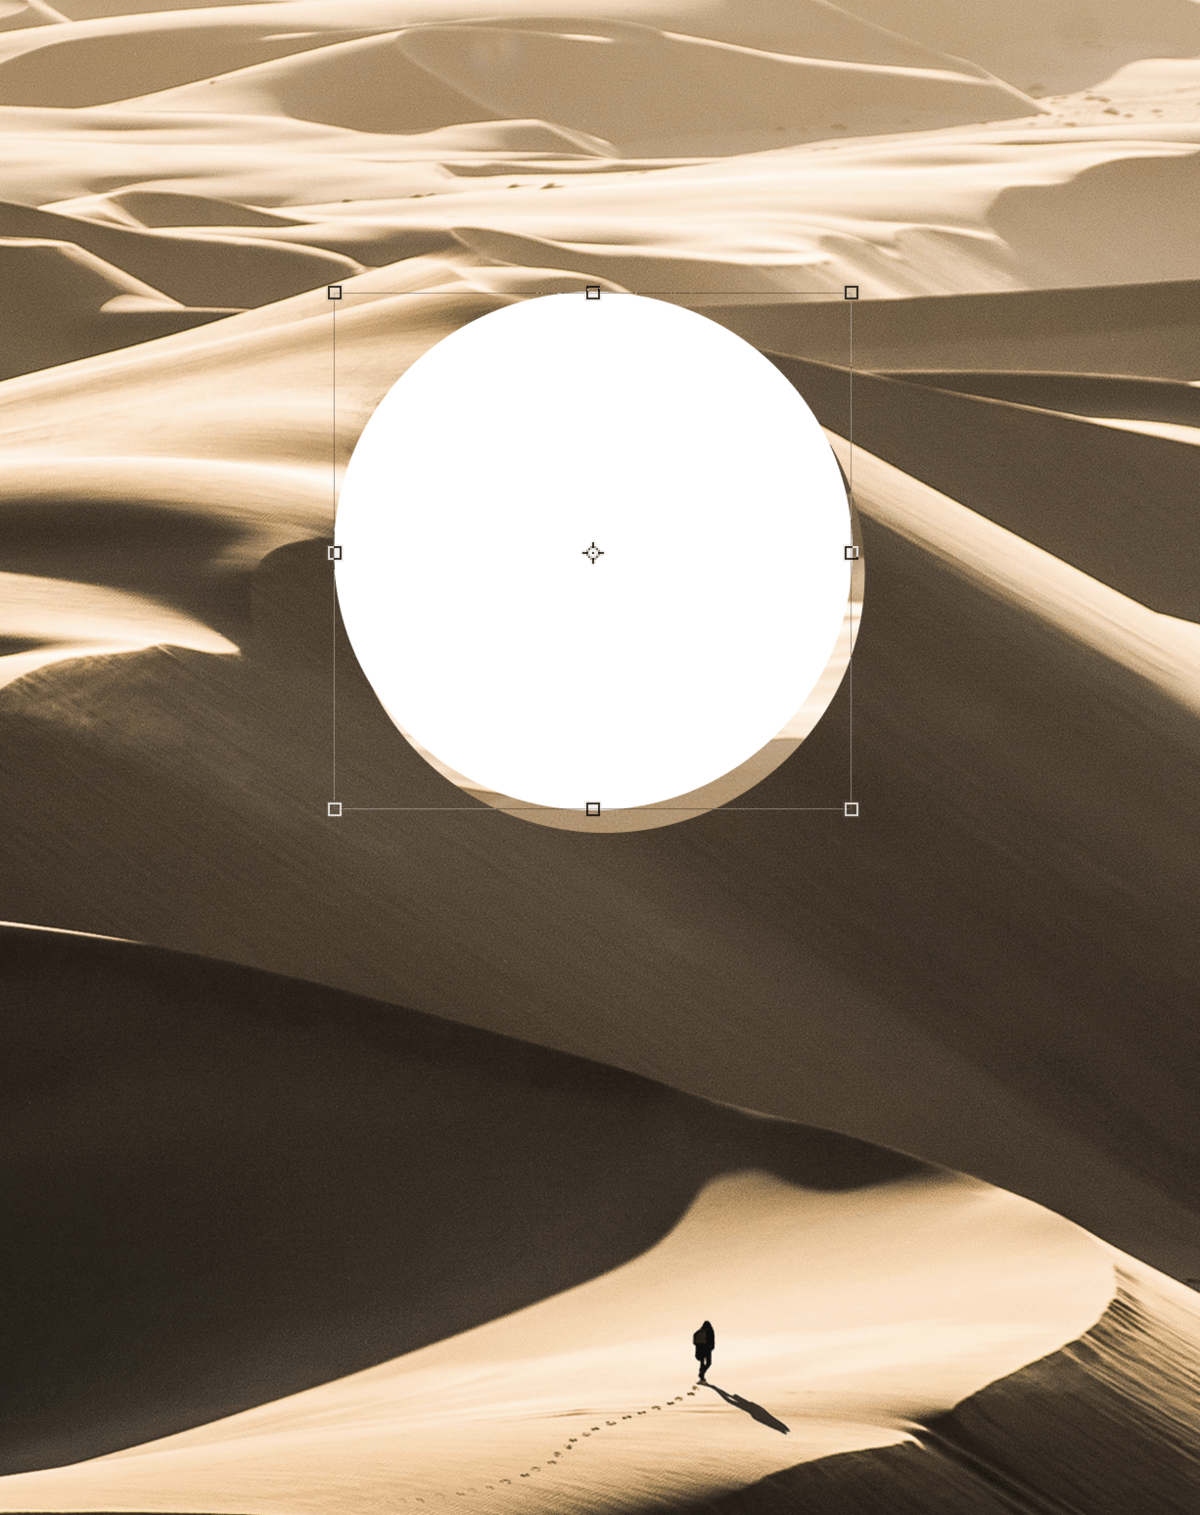 lens ball effect photoshop